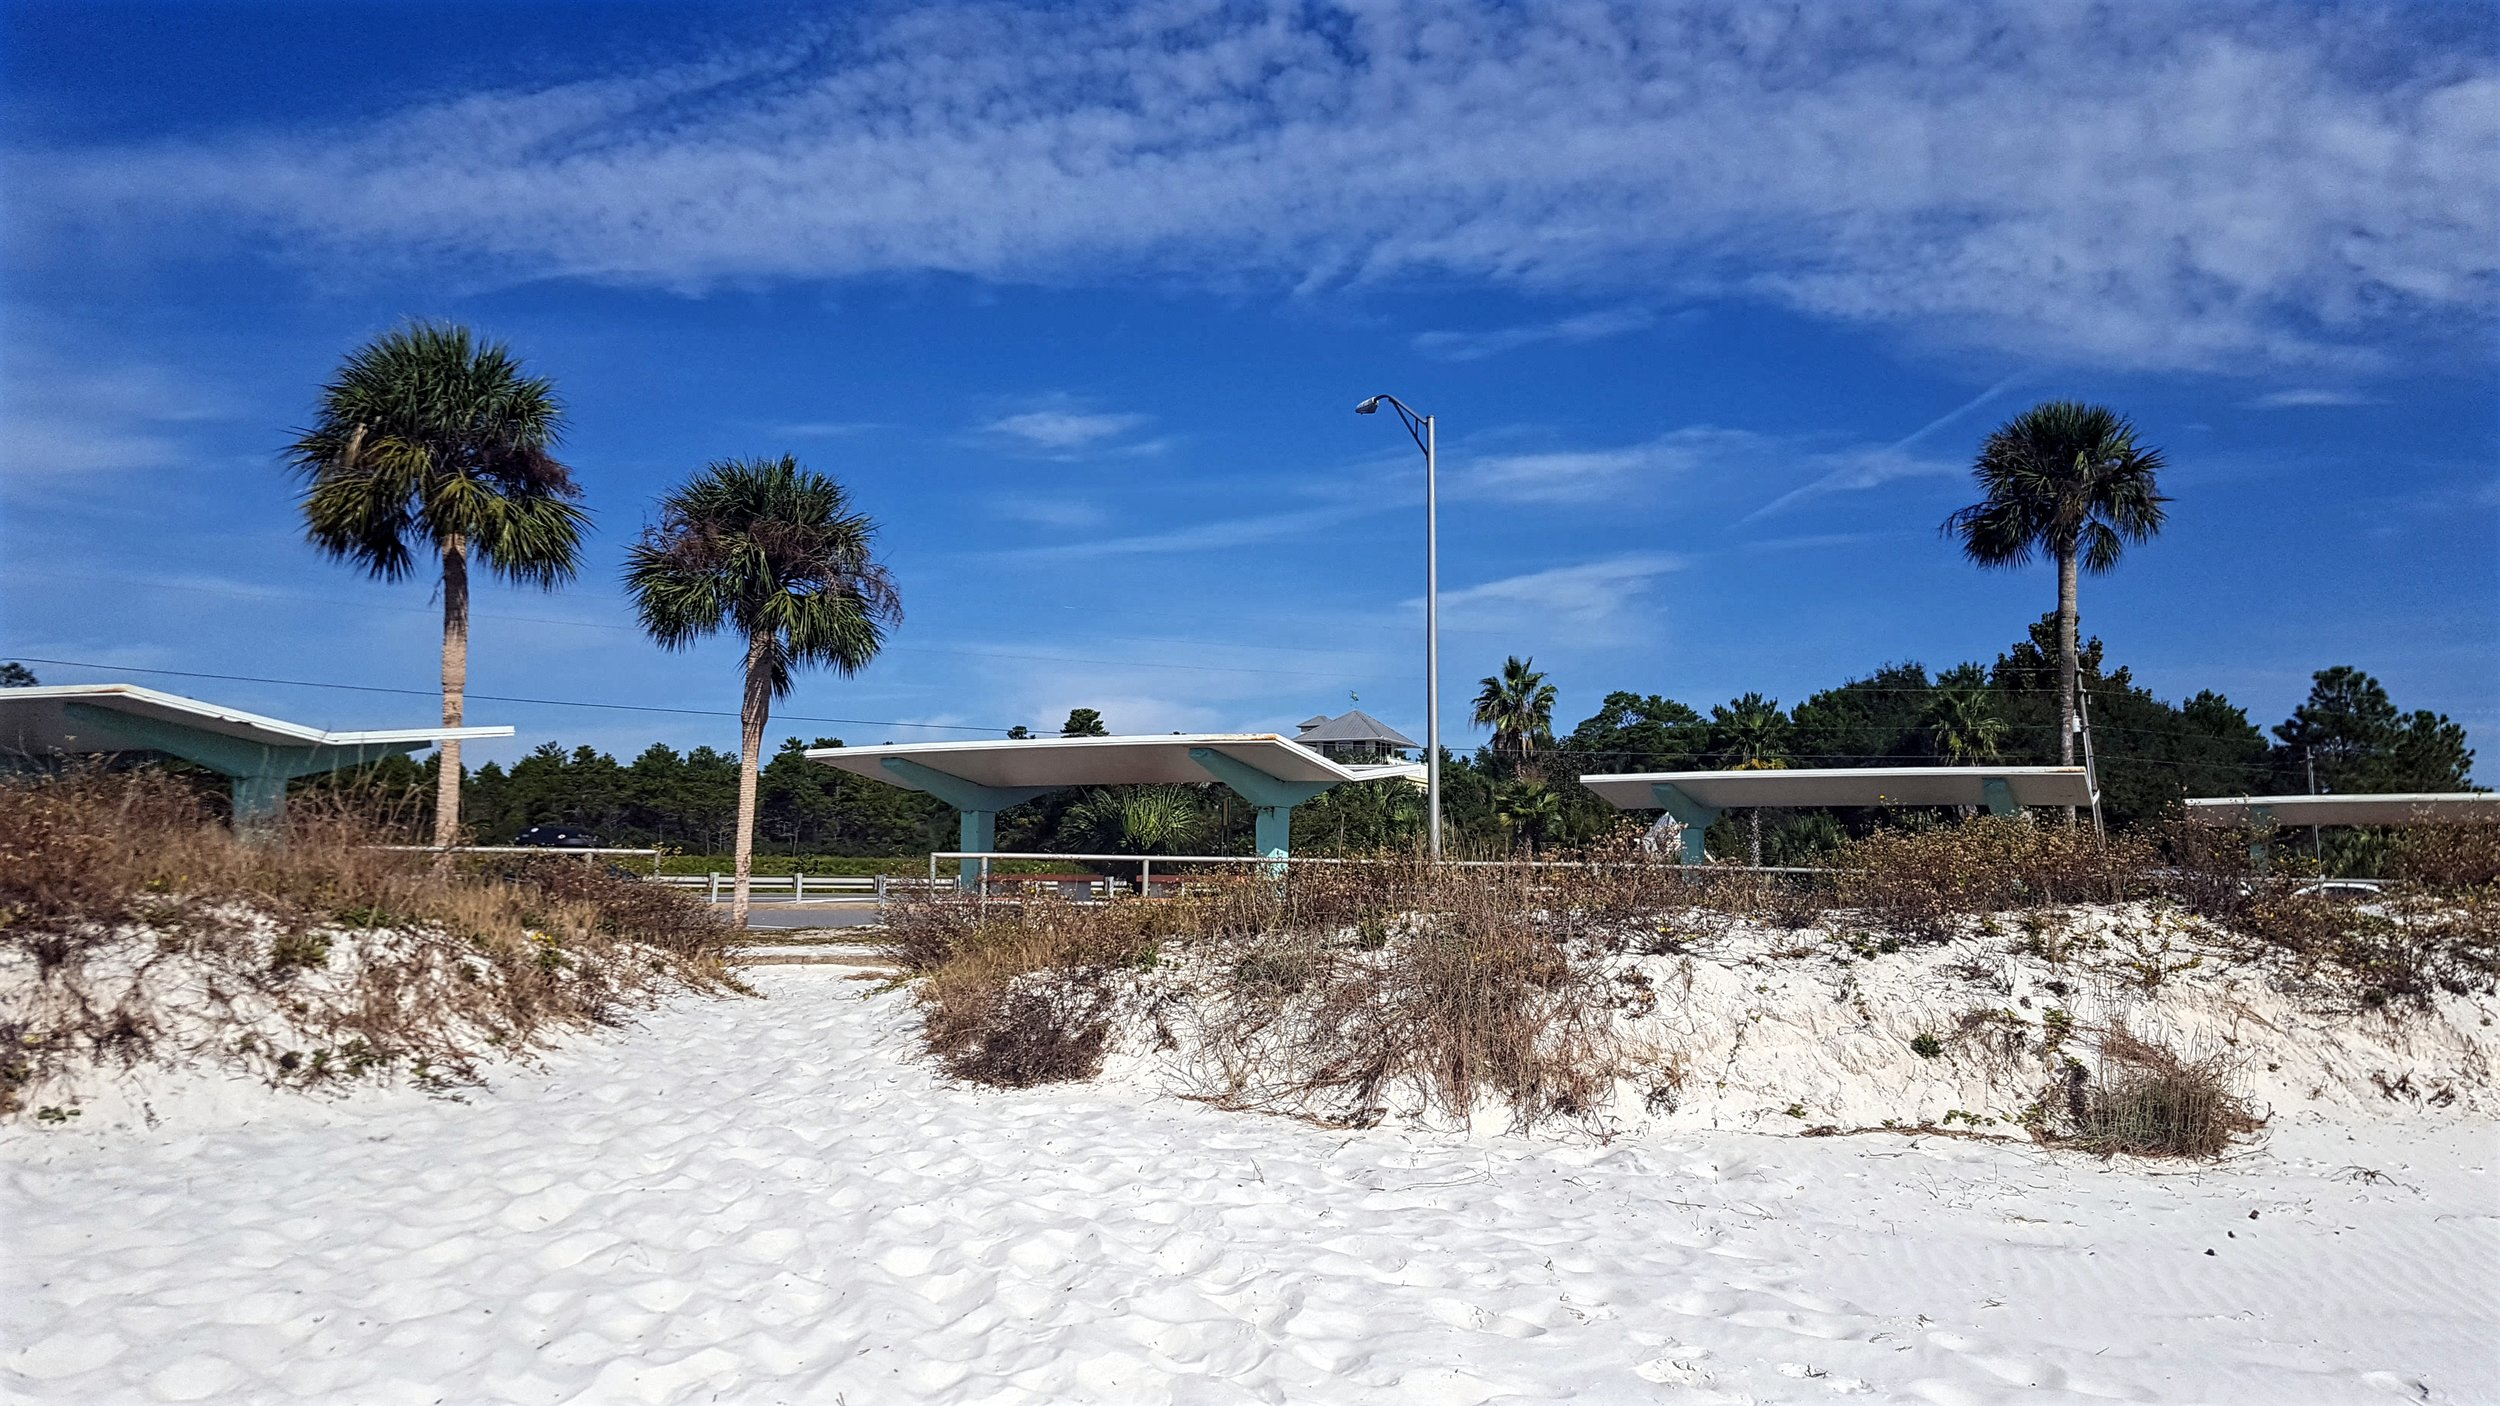 Carabelle Beach